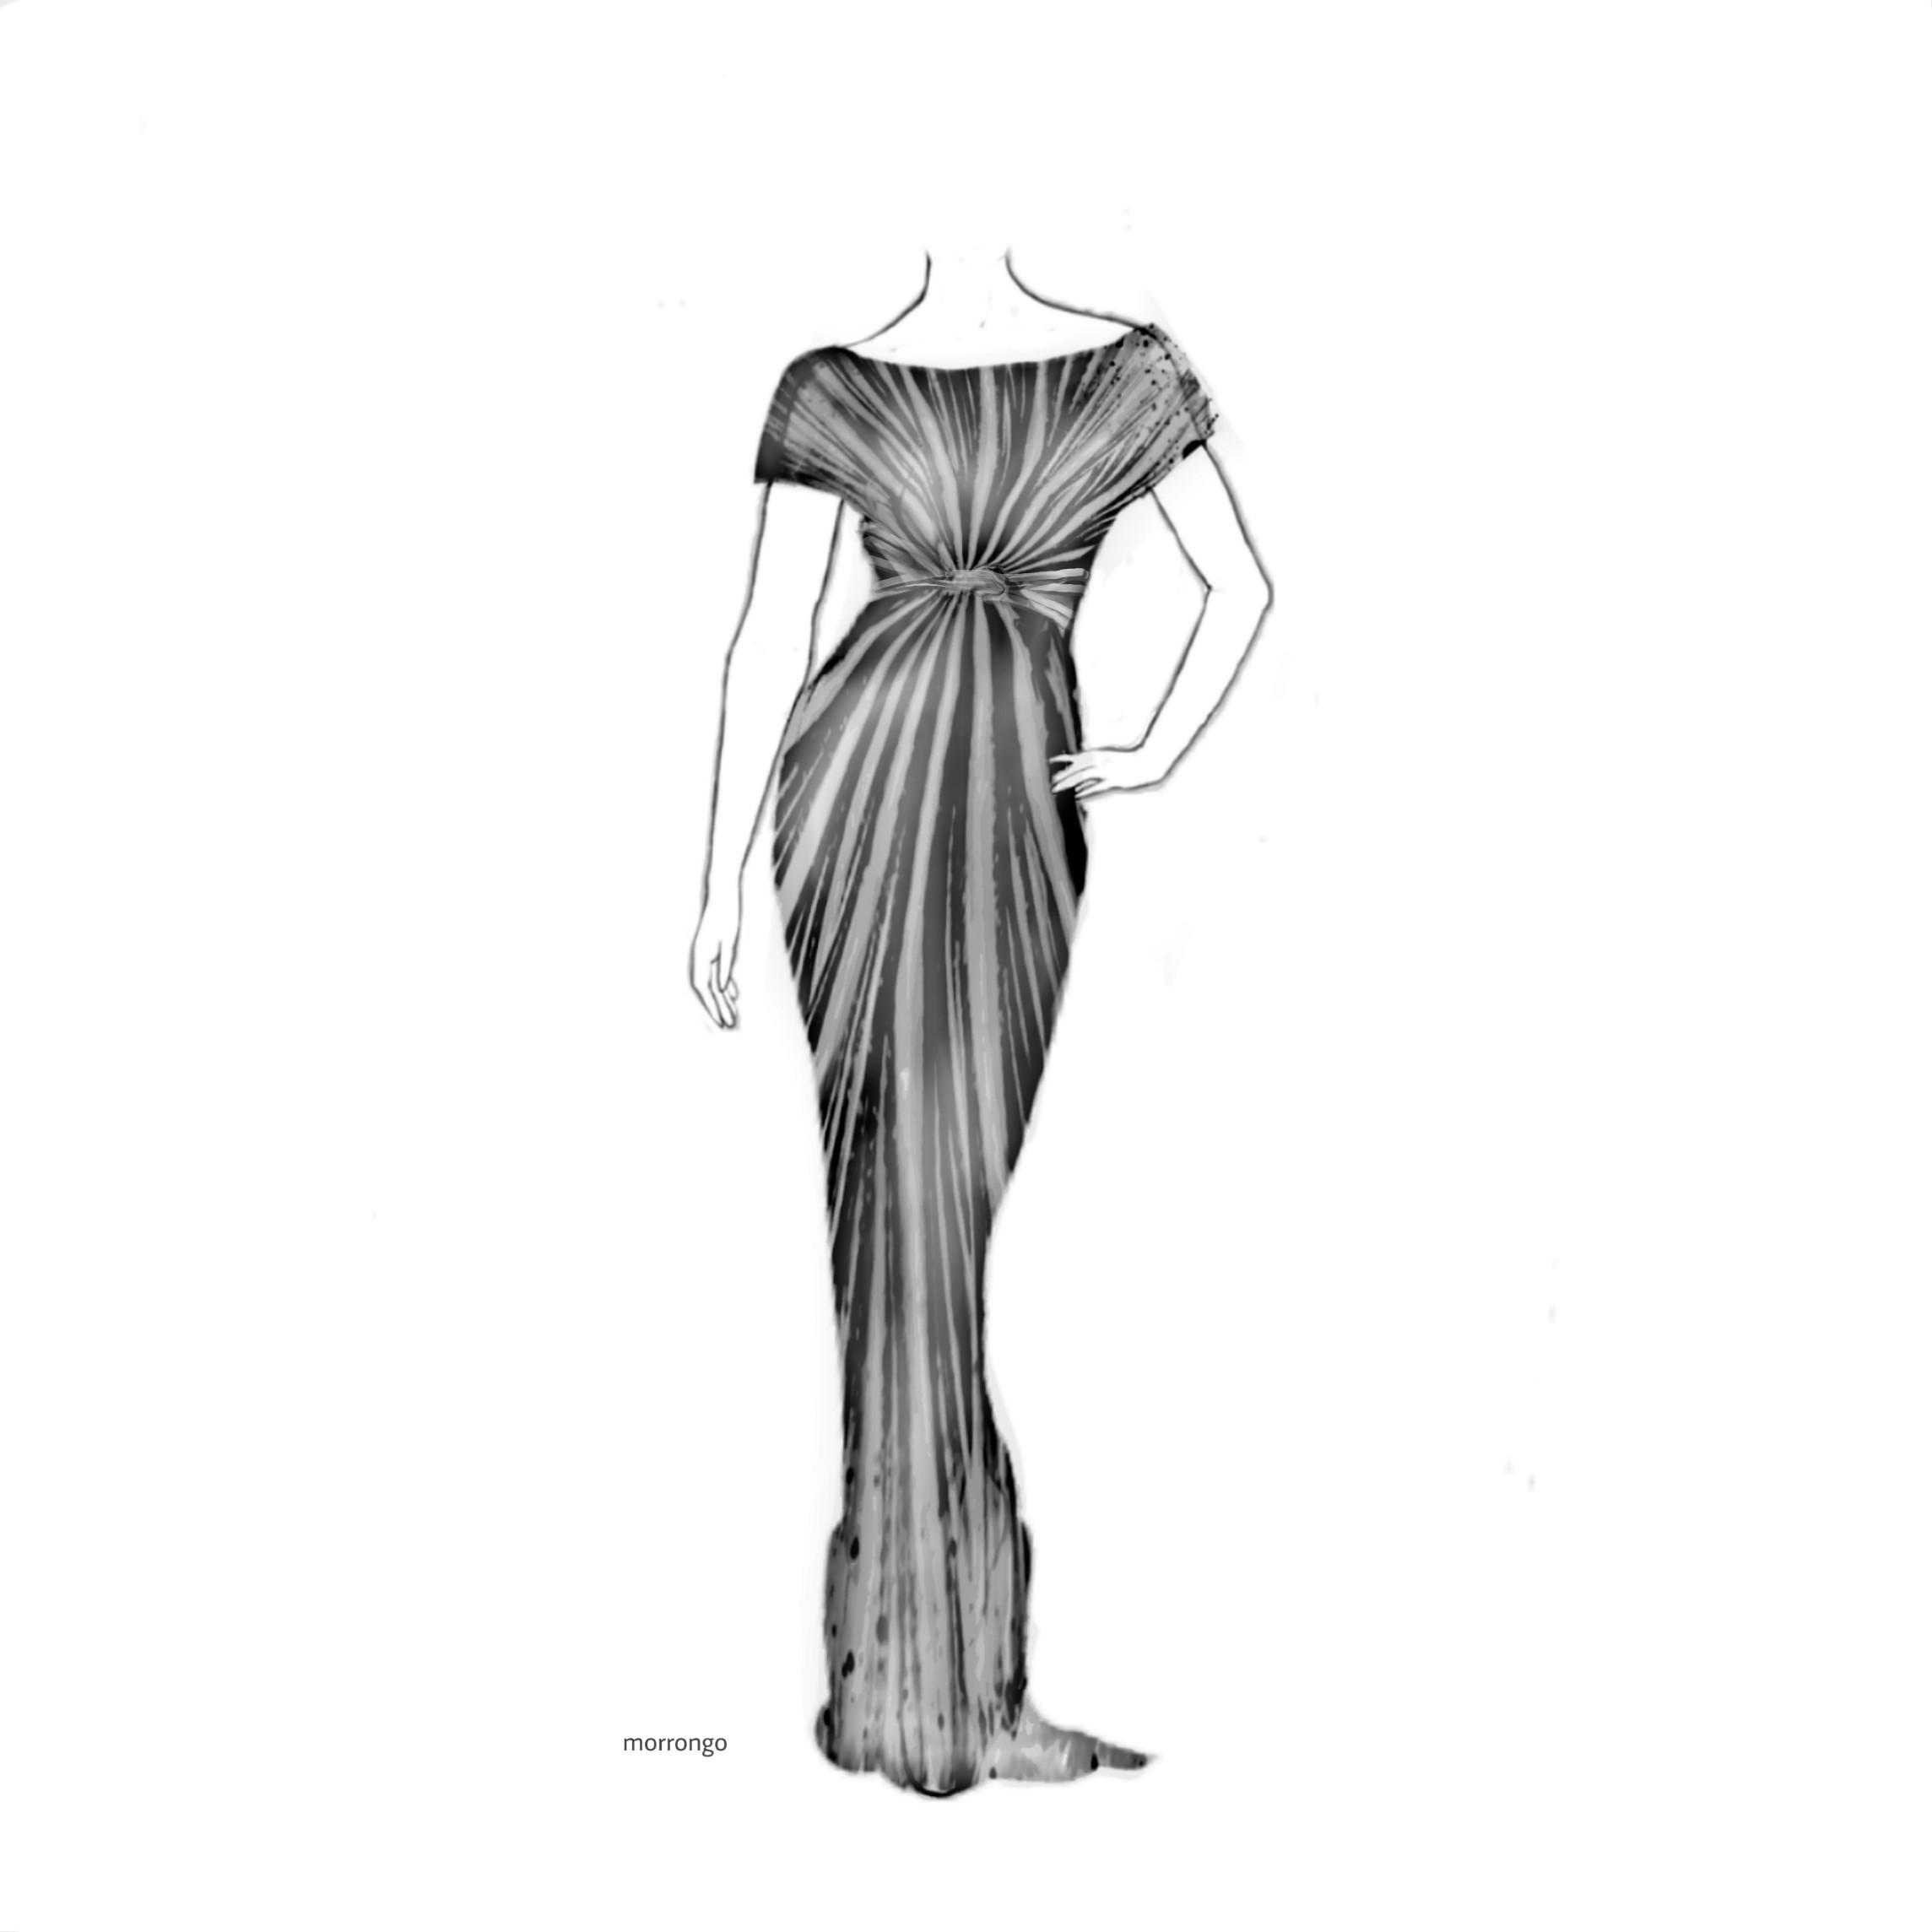 Dress Creative Mydesign Drawing Image By Jorge